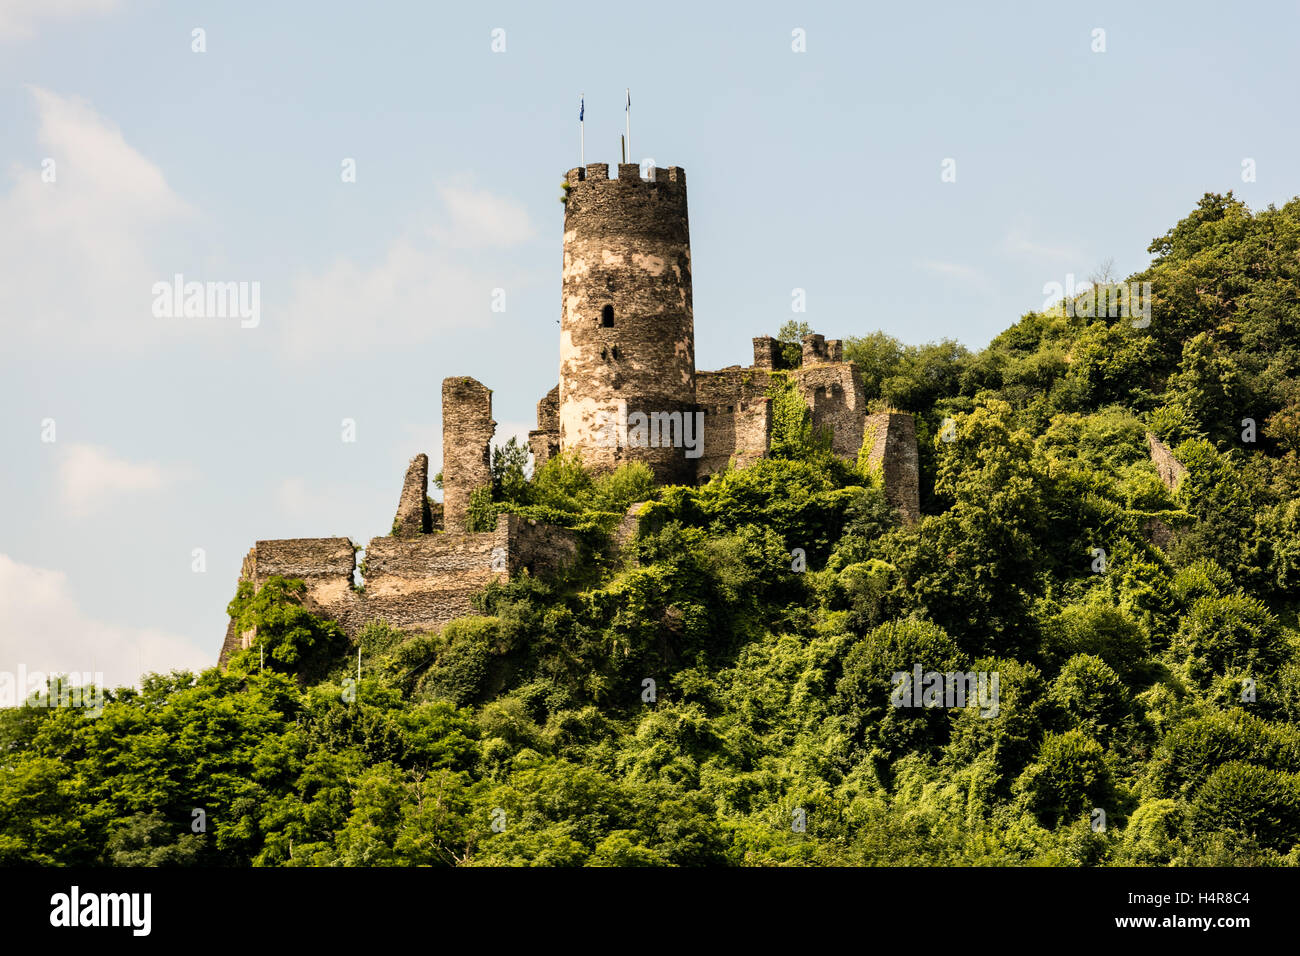 Fürstenberg Castle, Fairytale castle,  Rhine Gorge, Germany, Europe - Stock Image